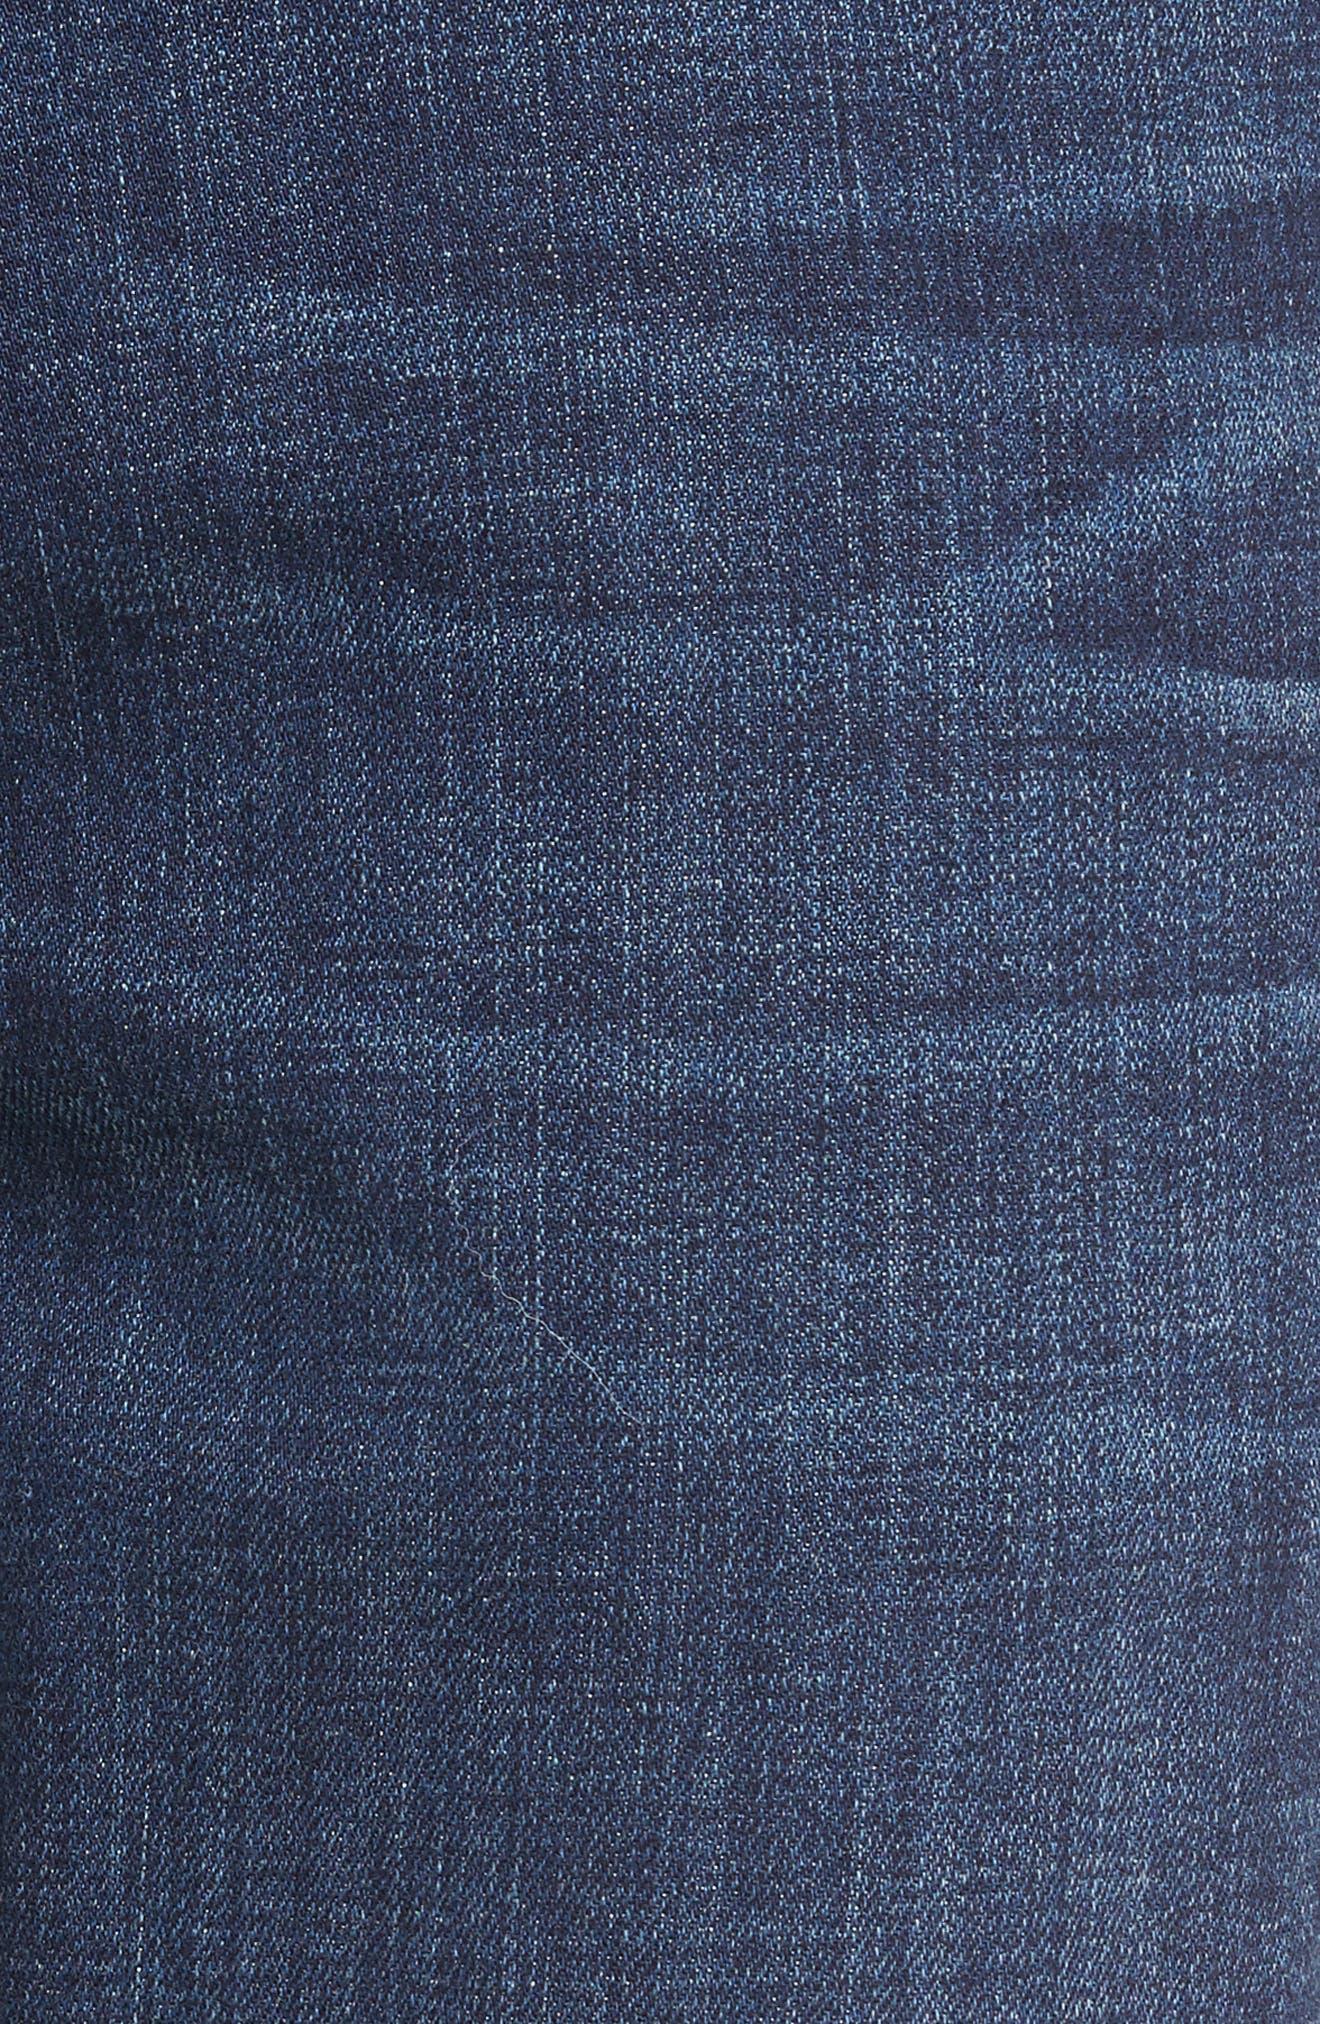 Normandie Straight Leg Jeans,                             Alternate thumbnail 5, color,                             ANGELO